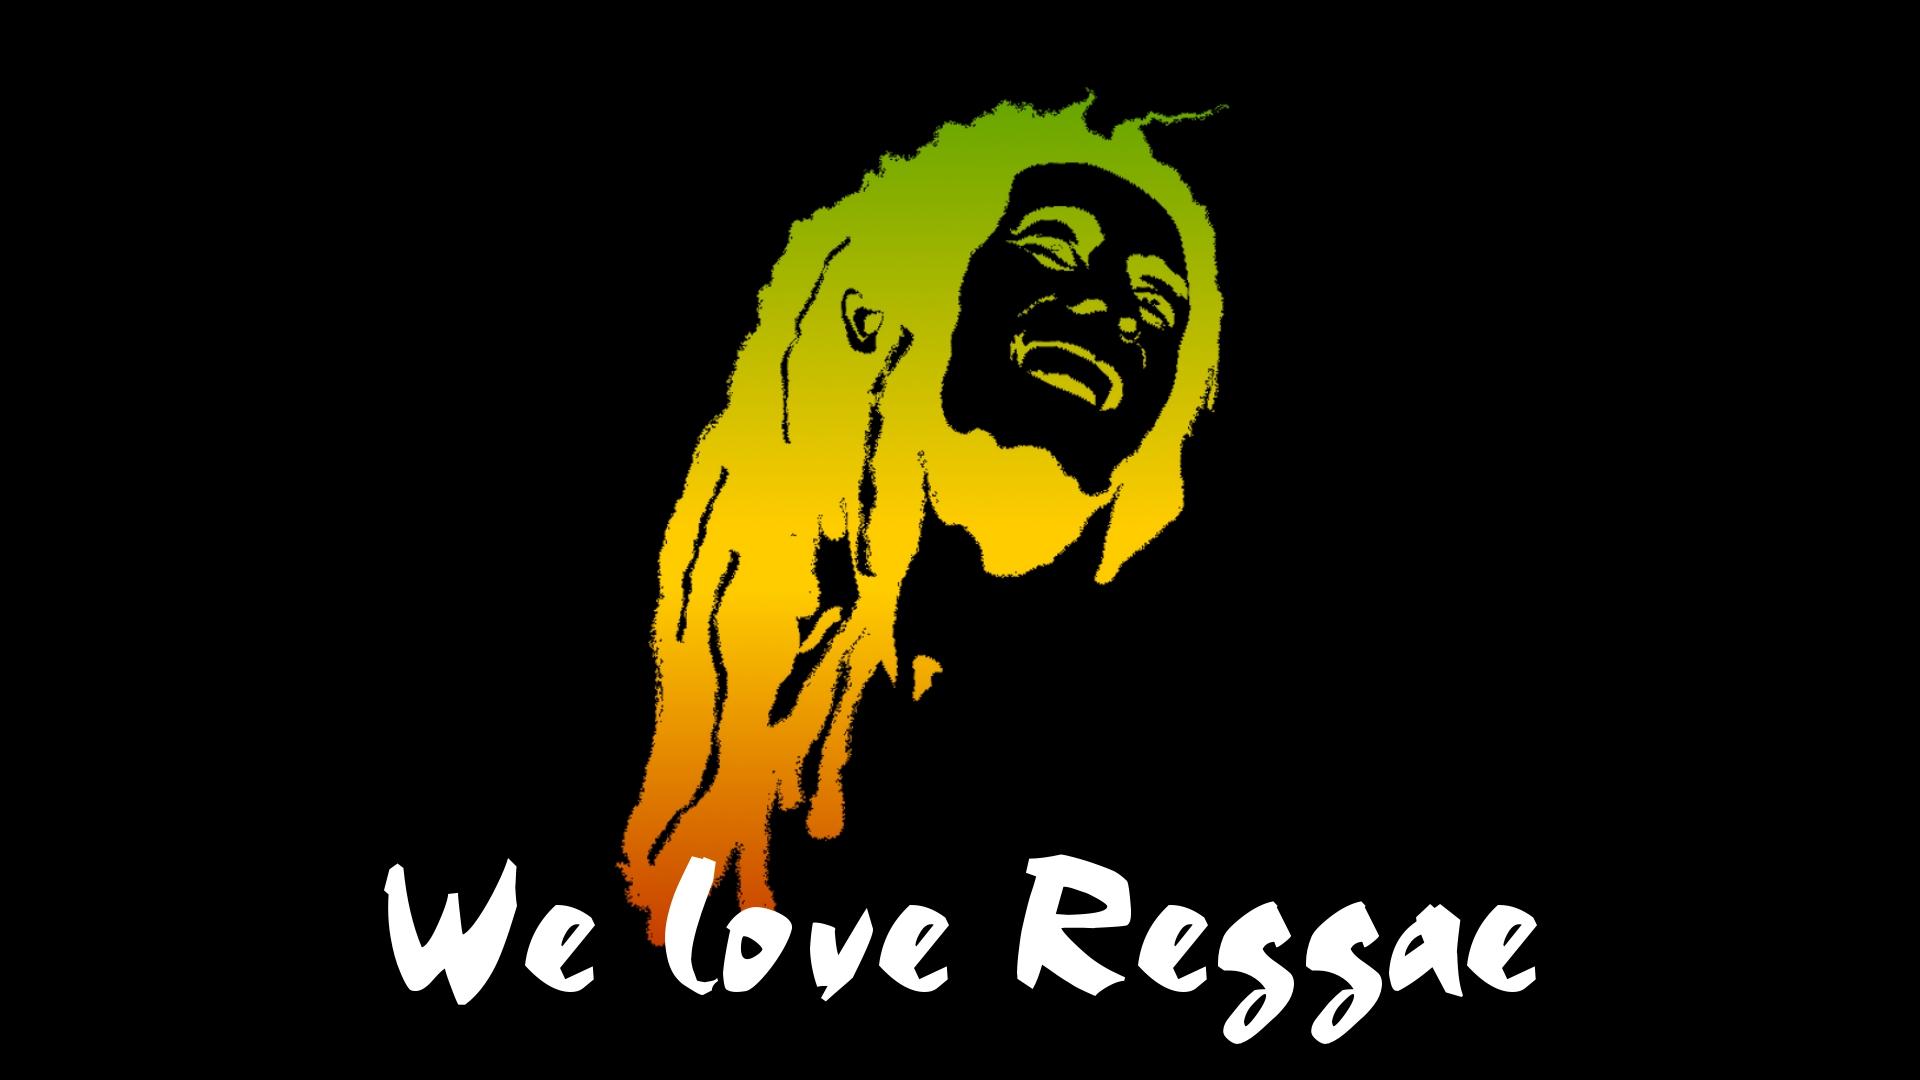 We love Reggae Wallpaper by Xilent2010 1920x1080